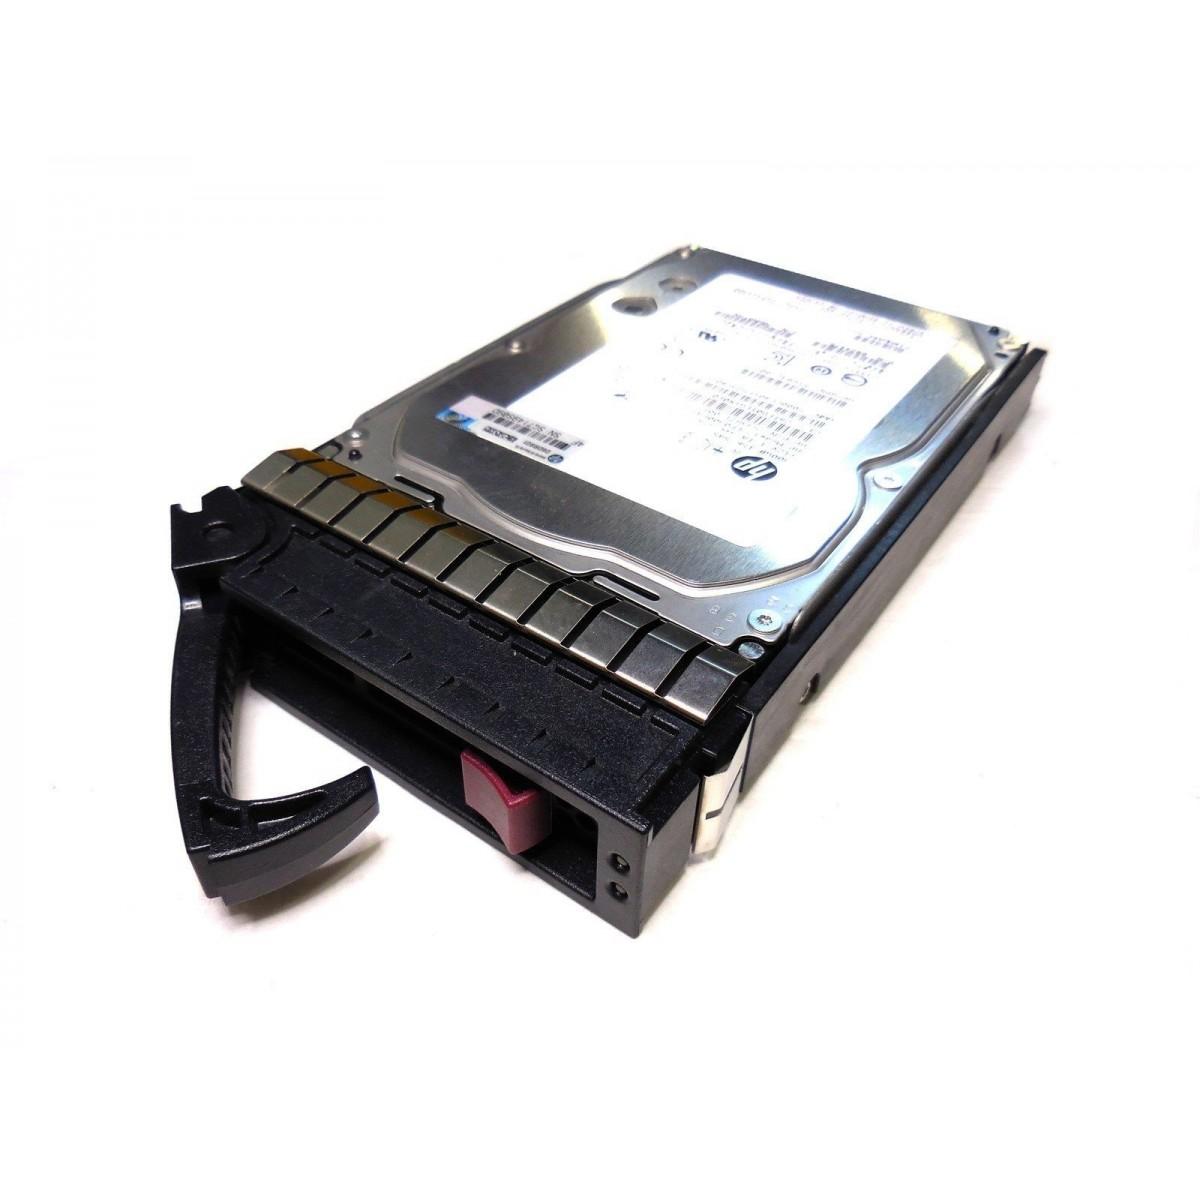 DYSK HP 300GB 6G 15K SAS RAMKA 533871-001